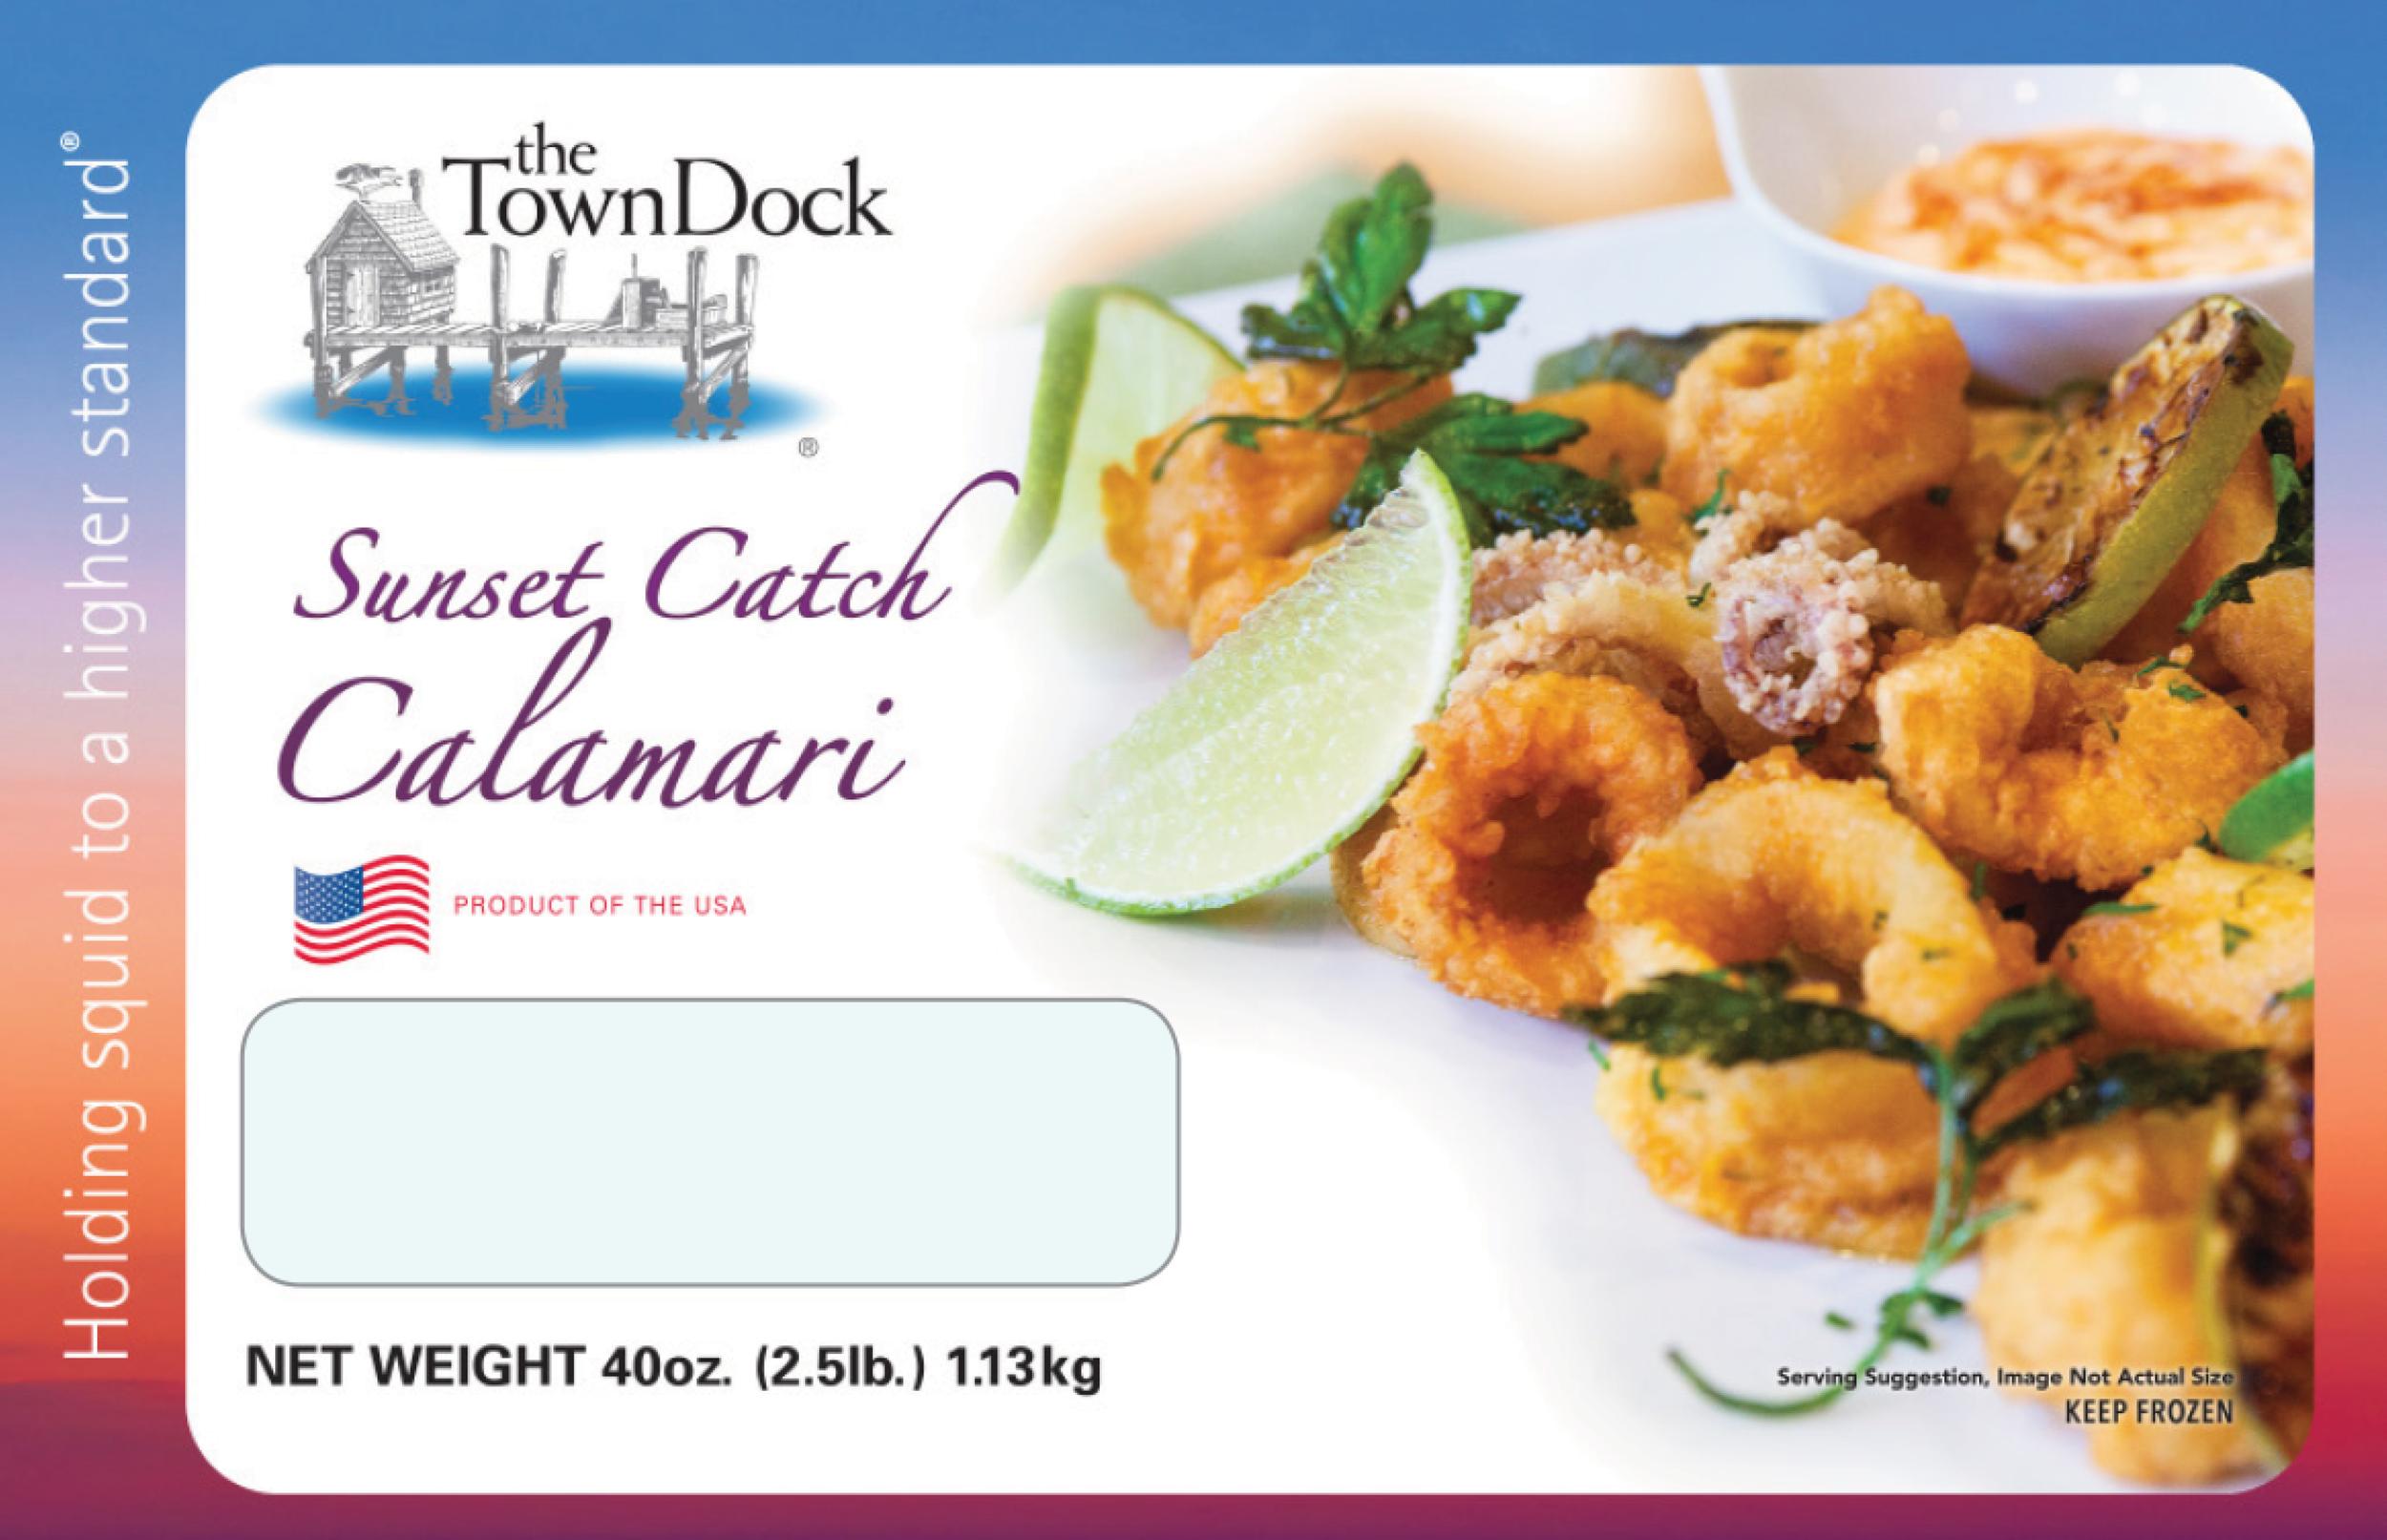 Sunset Catch Calamari